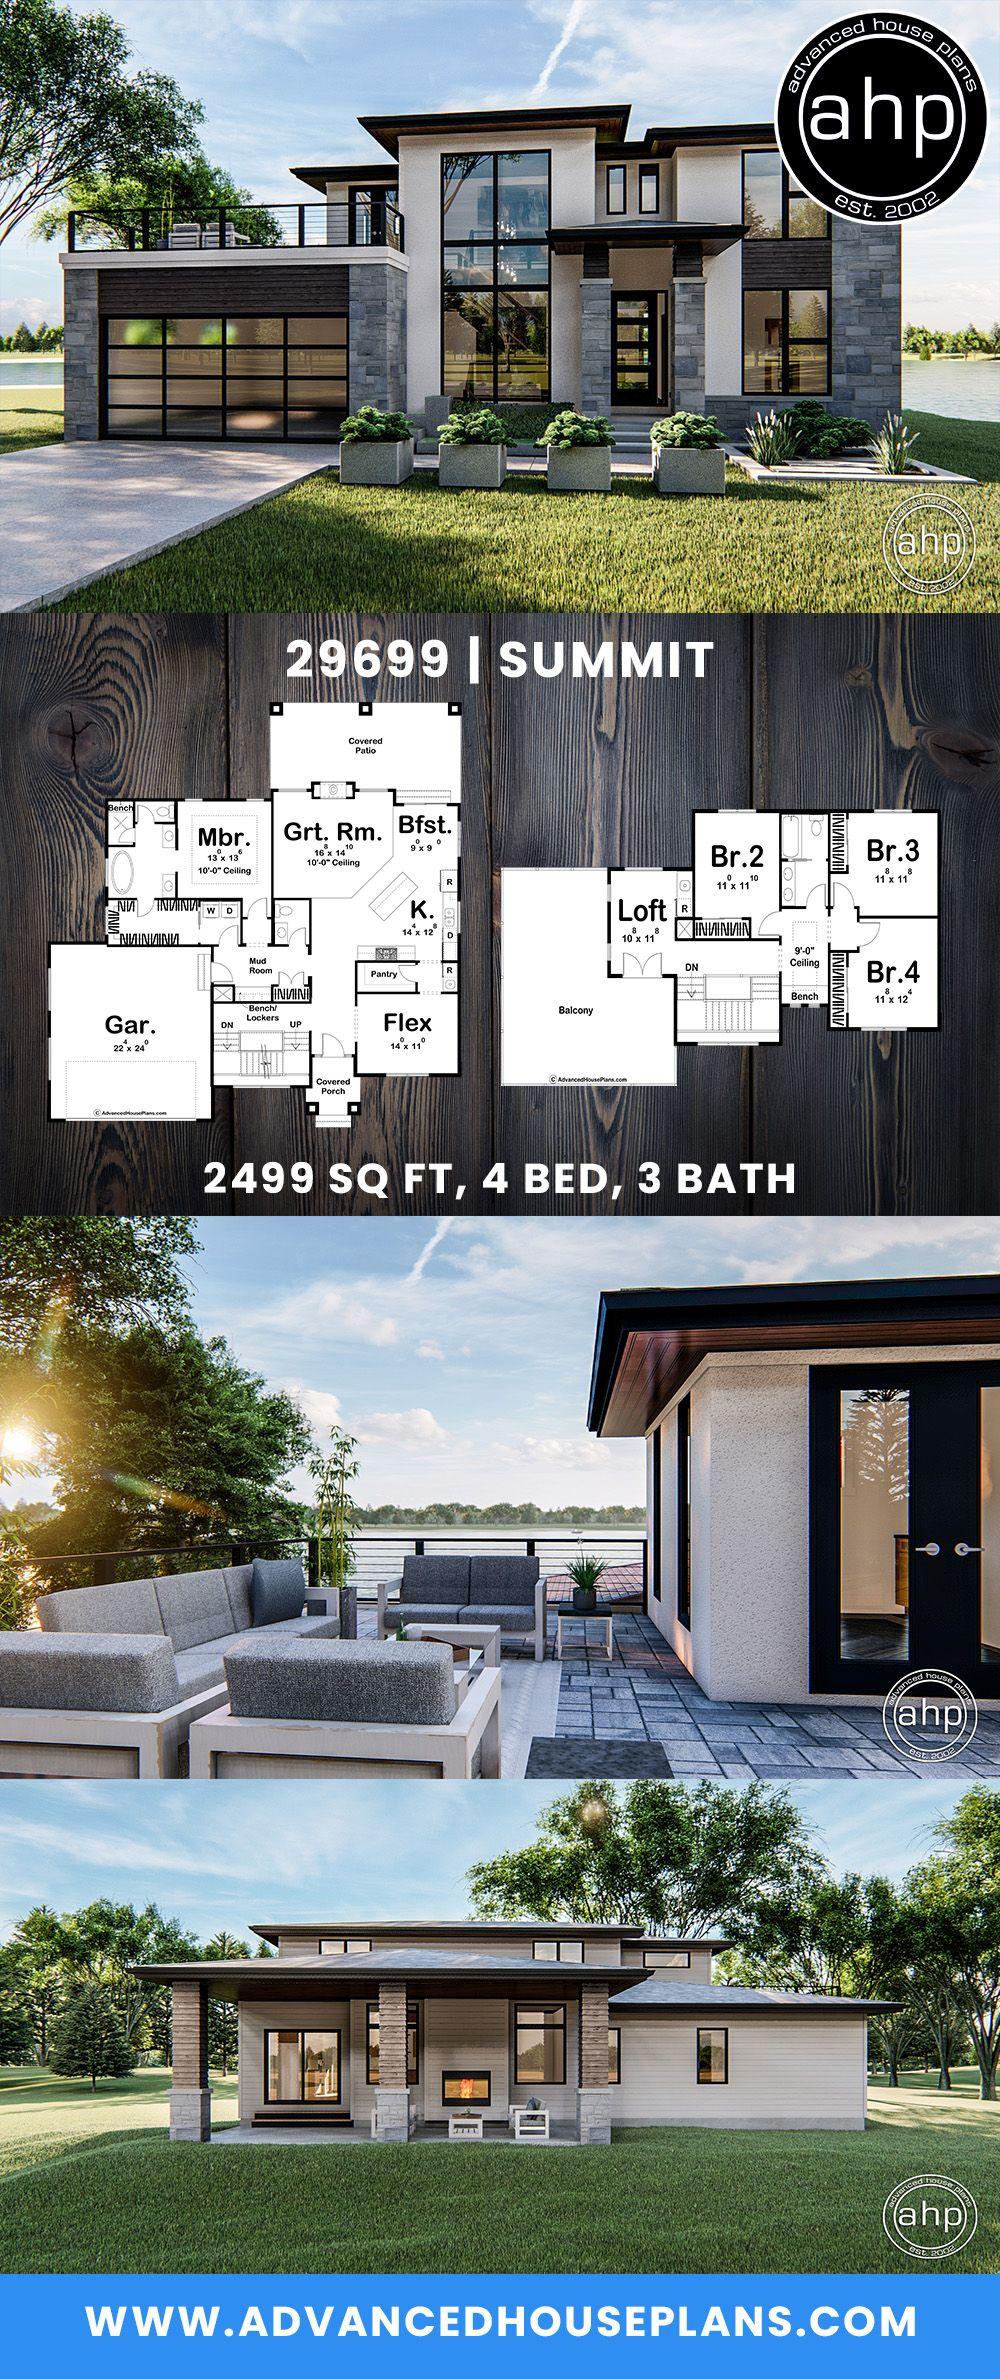 1 5 Story Modern Prairie House Plan Summit In 2020 Industrial House Plans House Plans House Blueprints